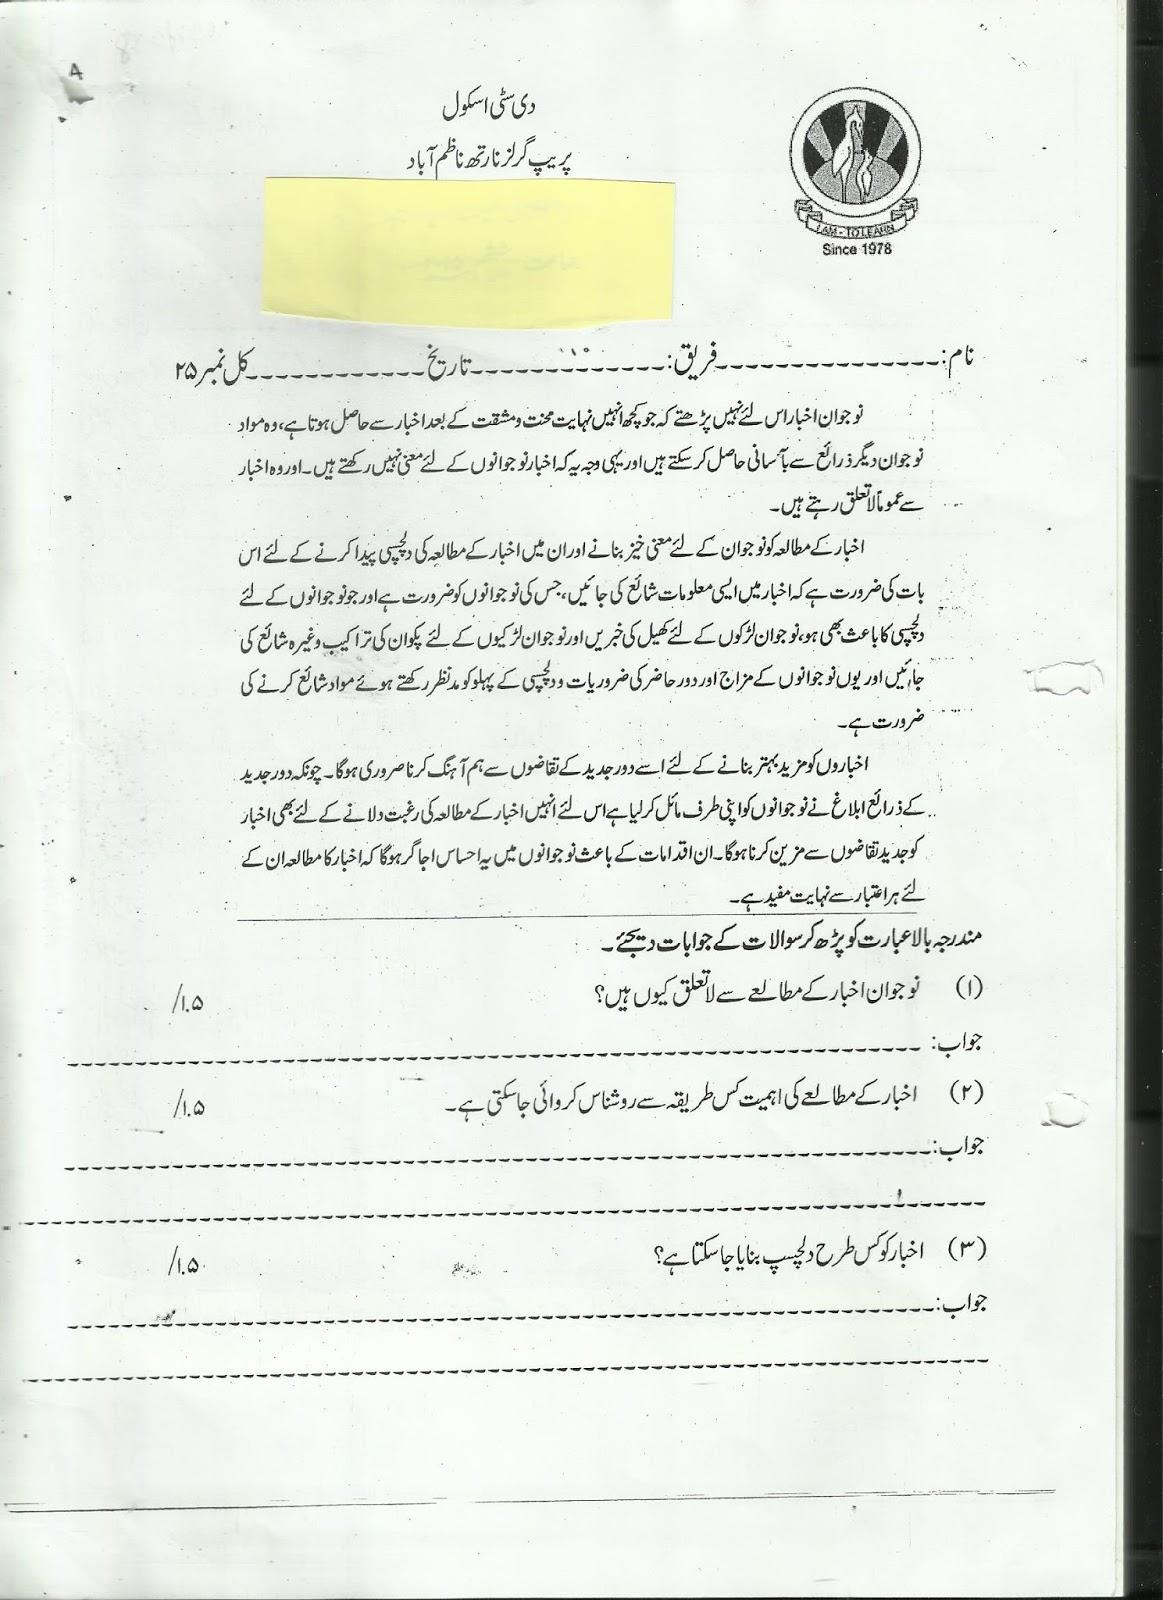 hight resolution of Urdu Tenses Worksheet For Grade 6   Printable Worksheets and Activities for  Teachers